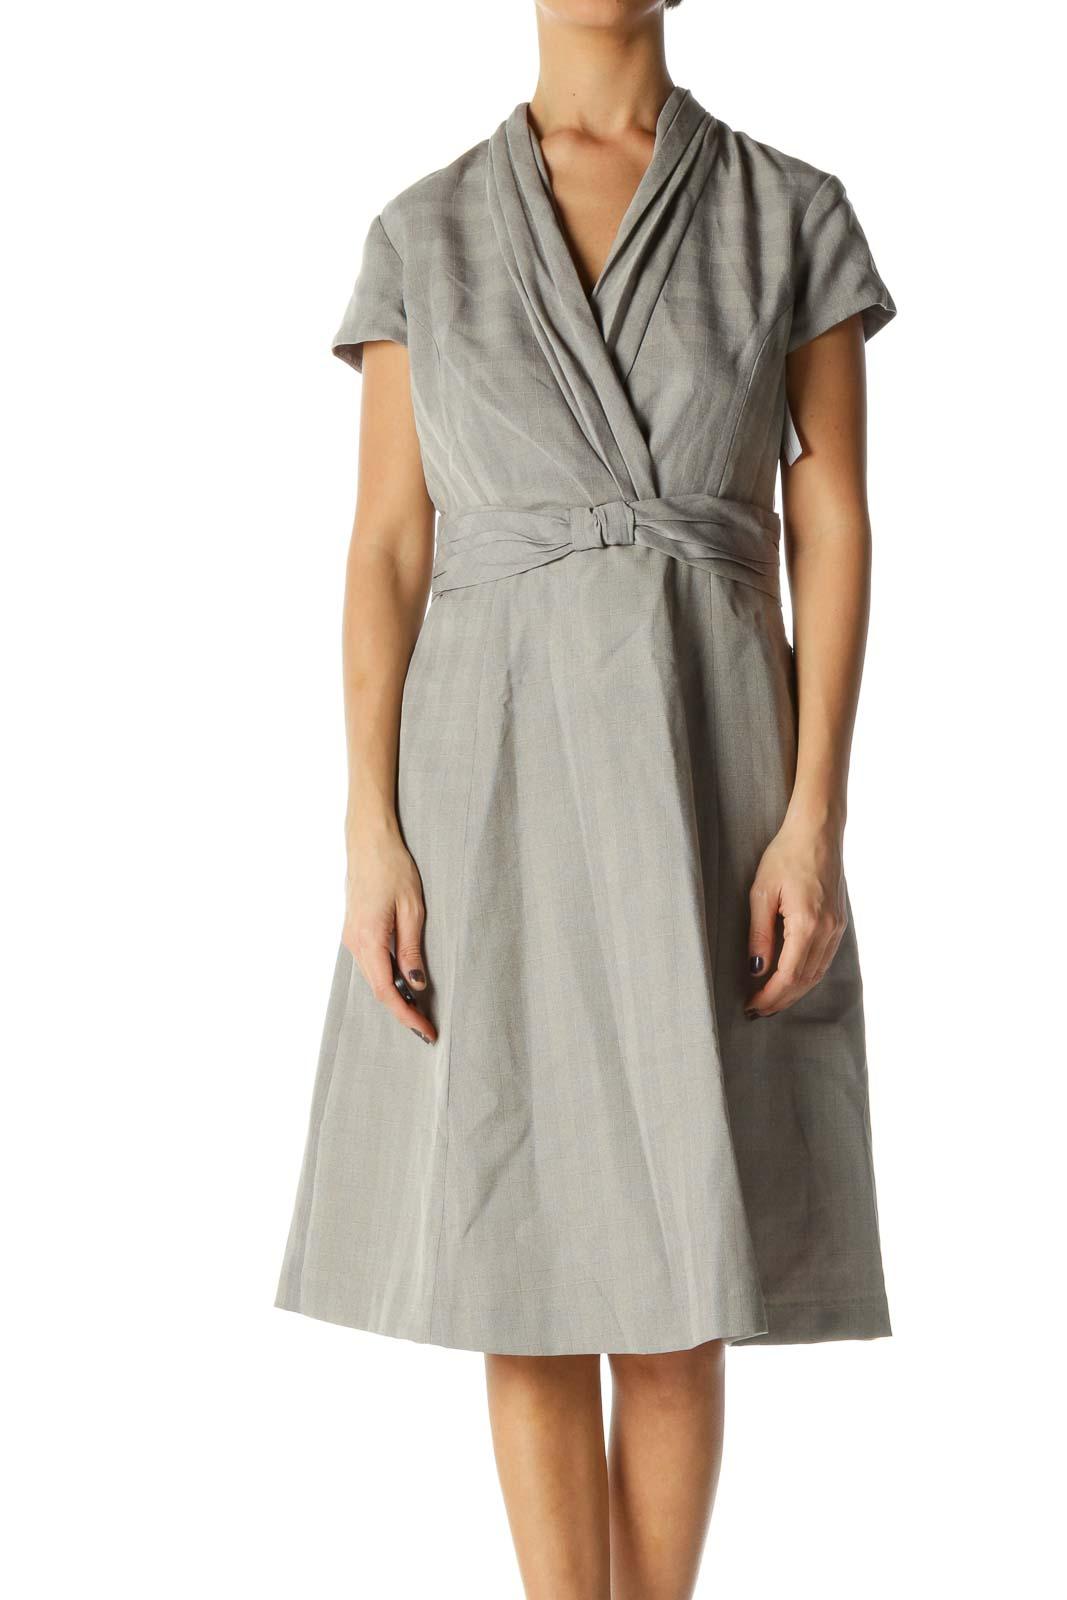 Gray Solid V Neck A-Line Dress Front